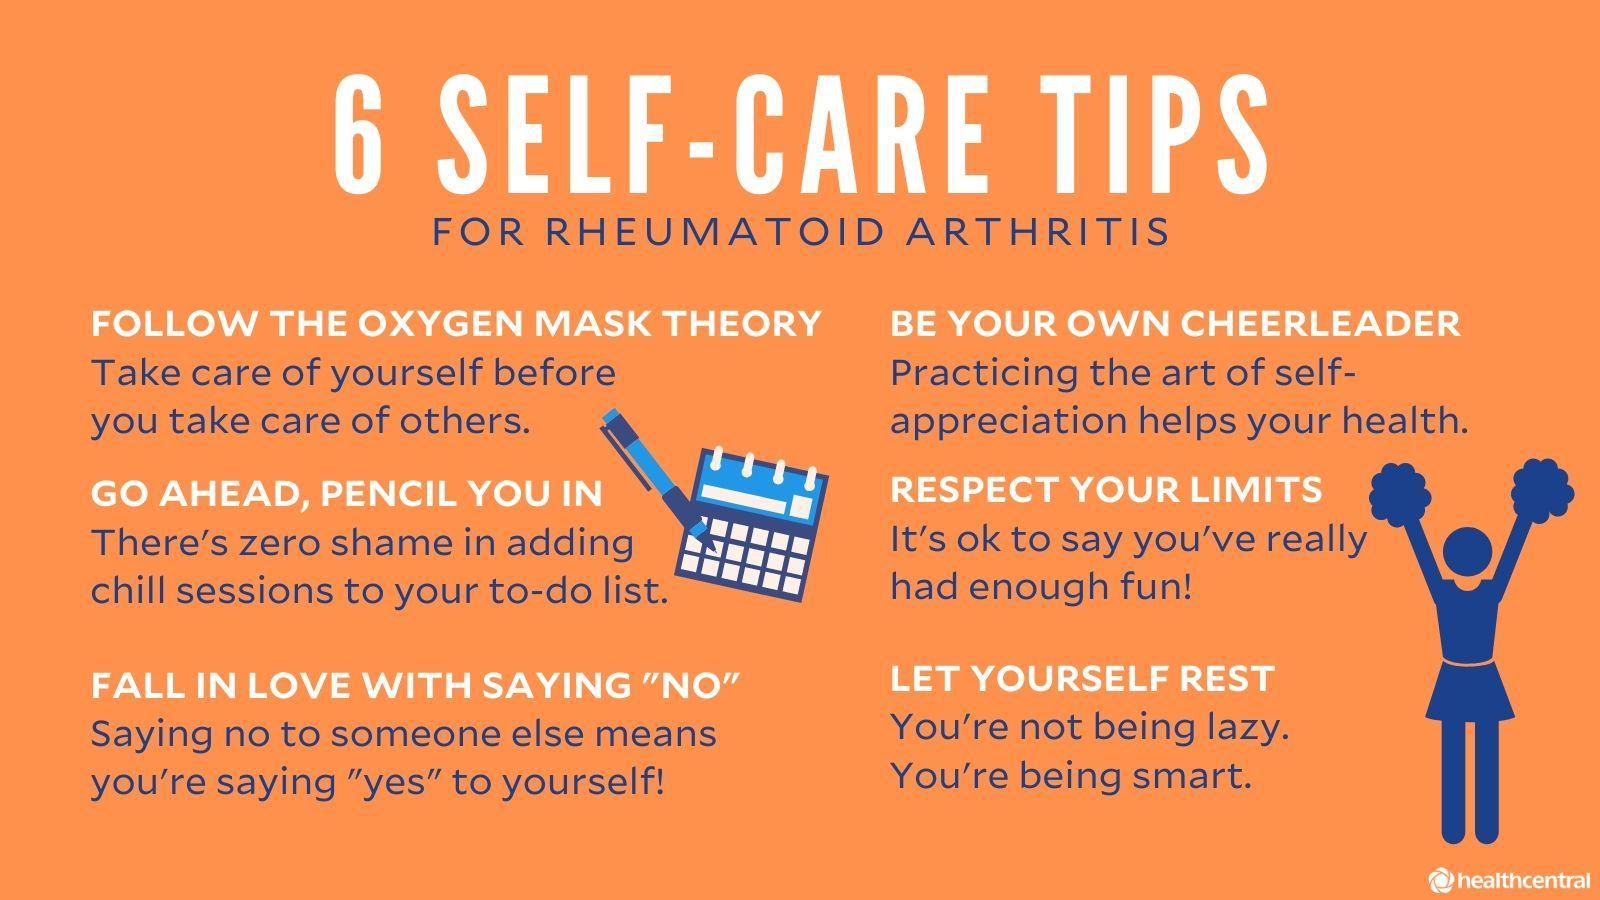 Self Care Tips For Ra In 2020 Rheumatoid Arthritis Symptoms Rheumatoid Arthritis Arthritis Symptoms